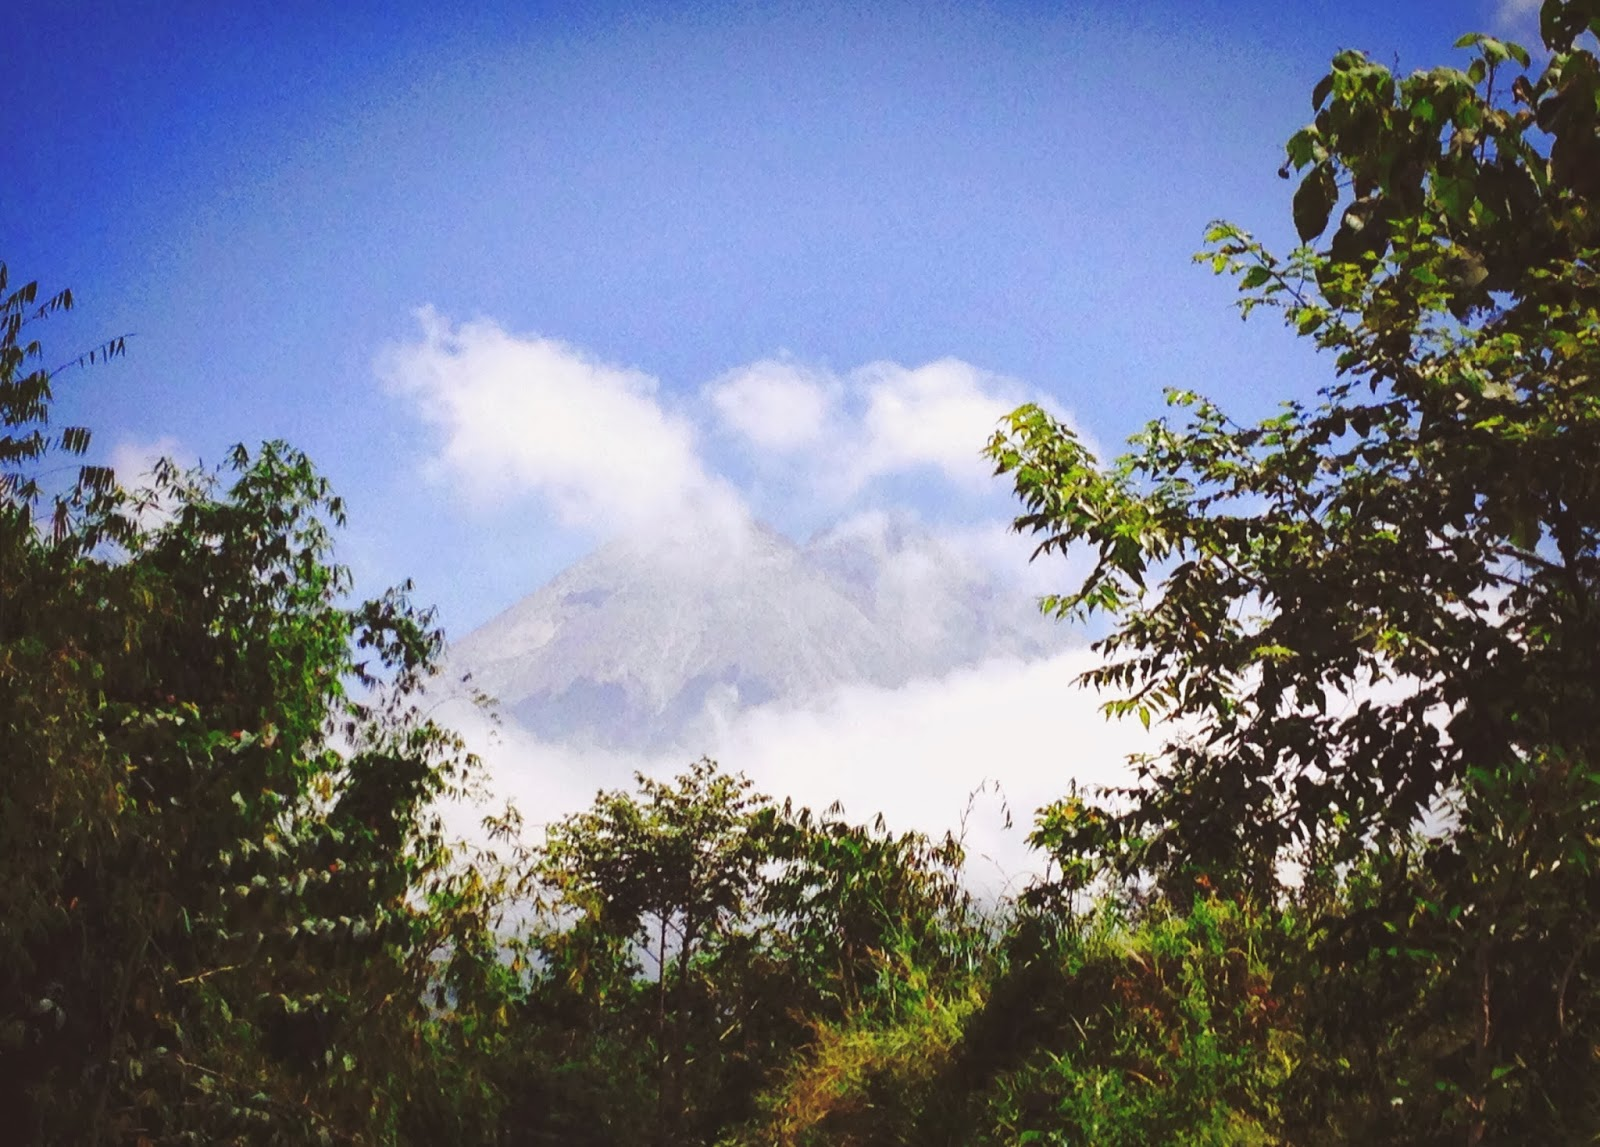 Yogyakarta Mount Merapi